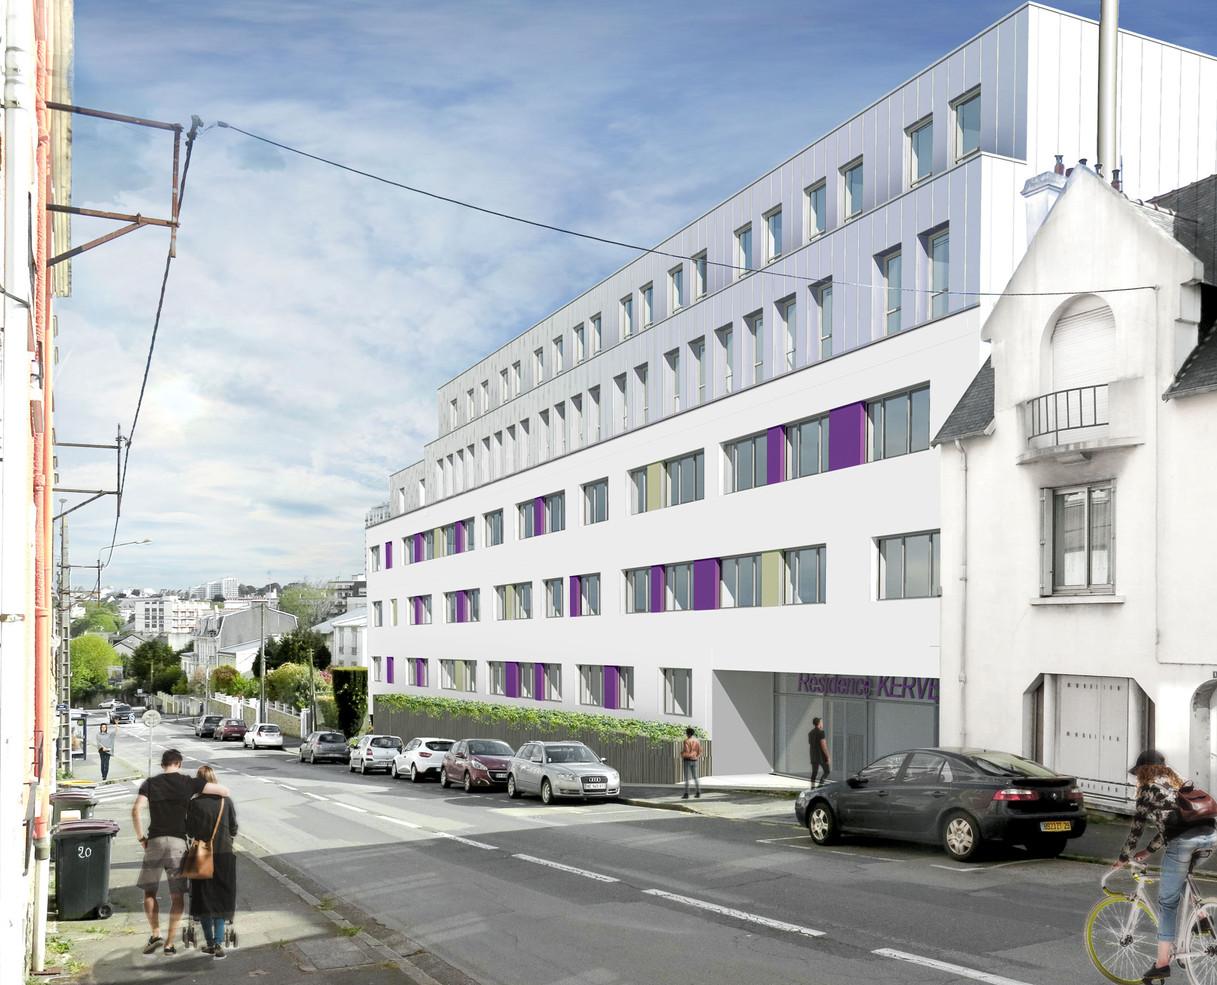 Résidence étudiante Kervern - Brest